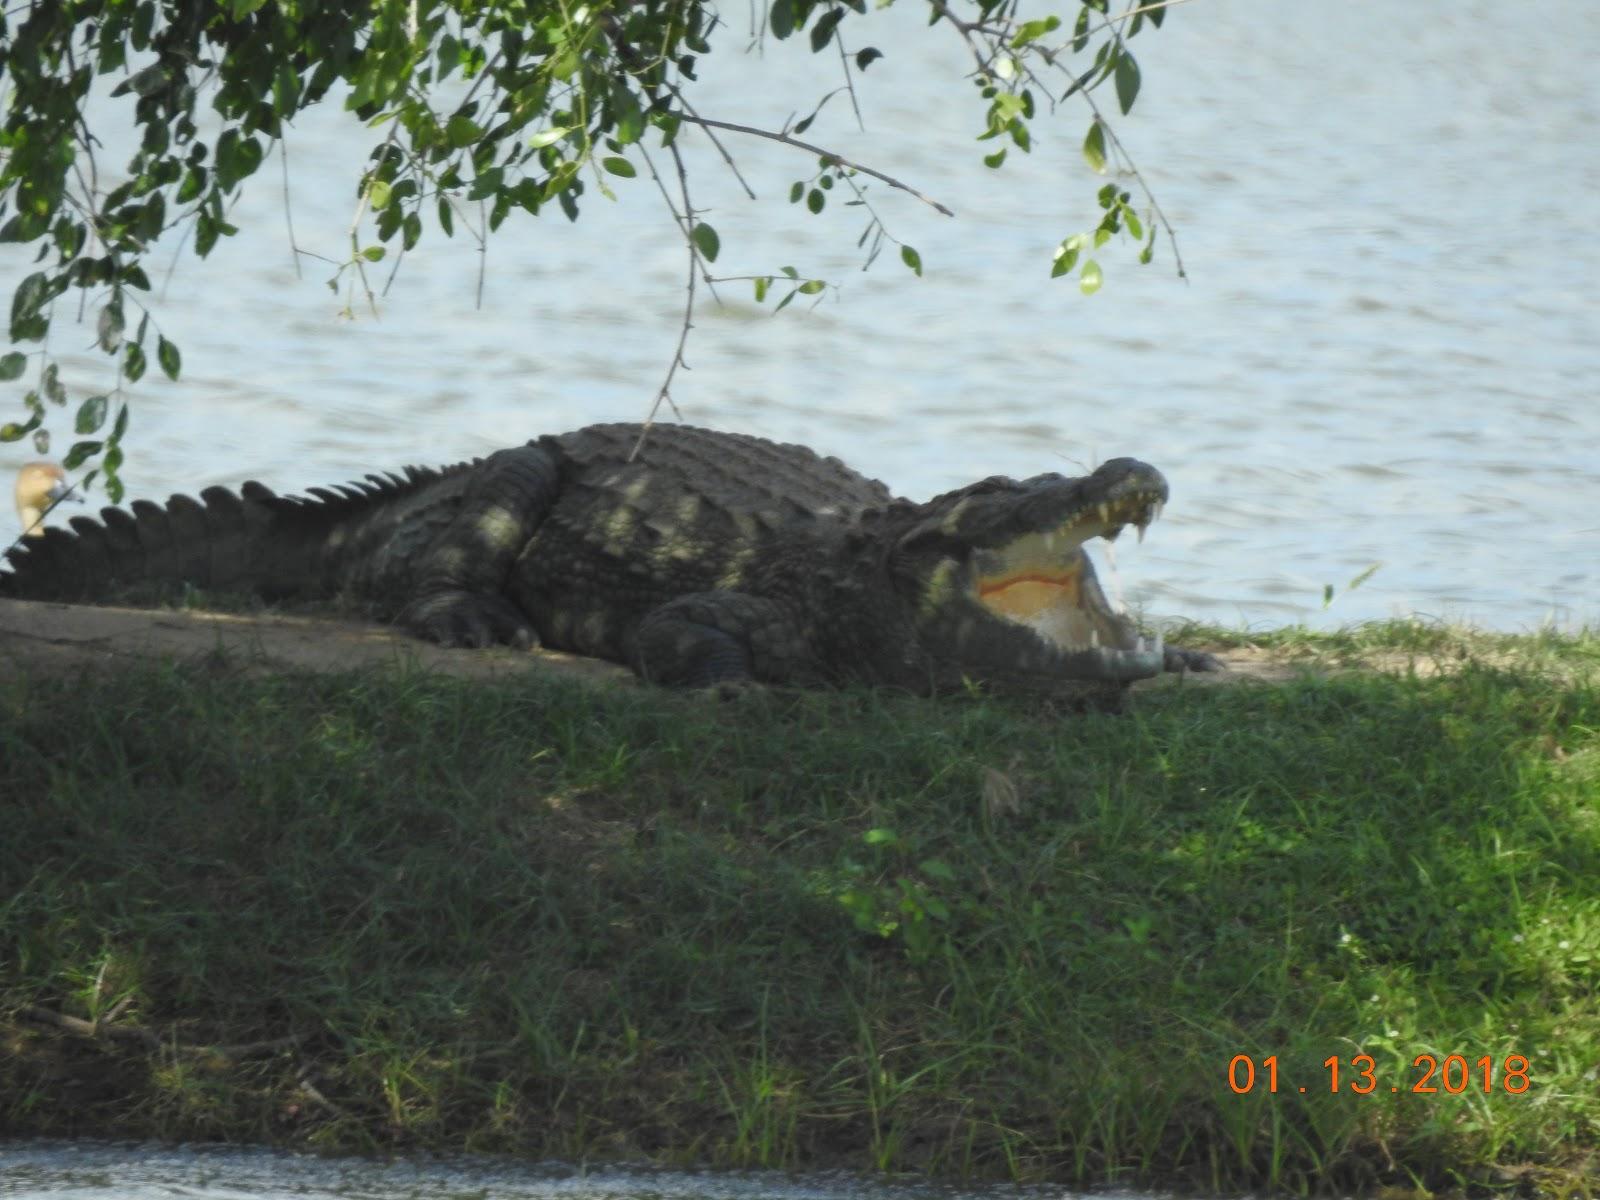 invite-to-paradise-sri-lanka-maldives-holiday-specialists-nutan-vidyut-patel-crocodile.jpg